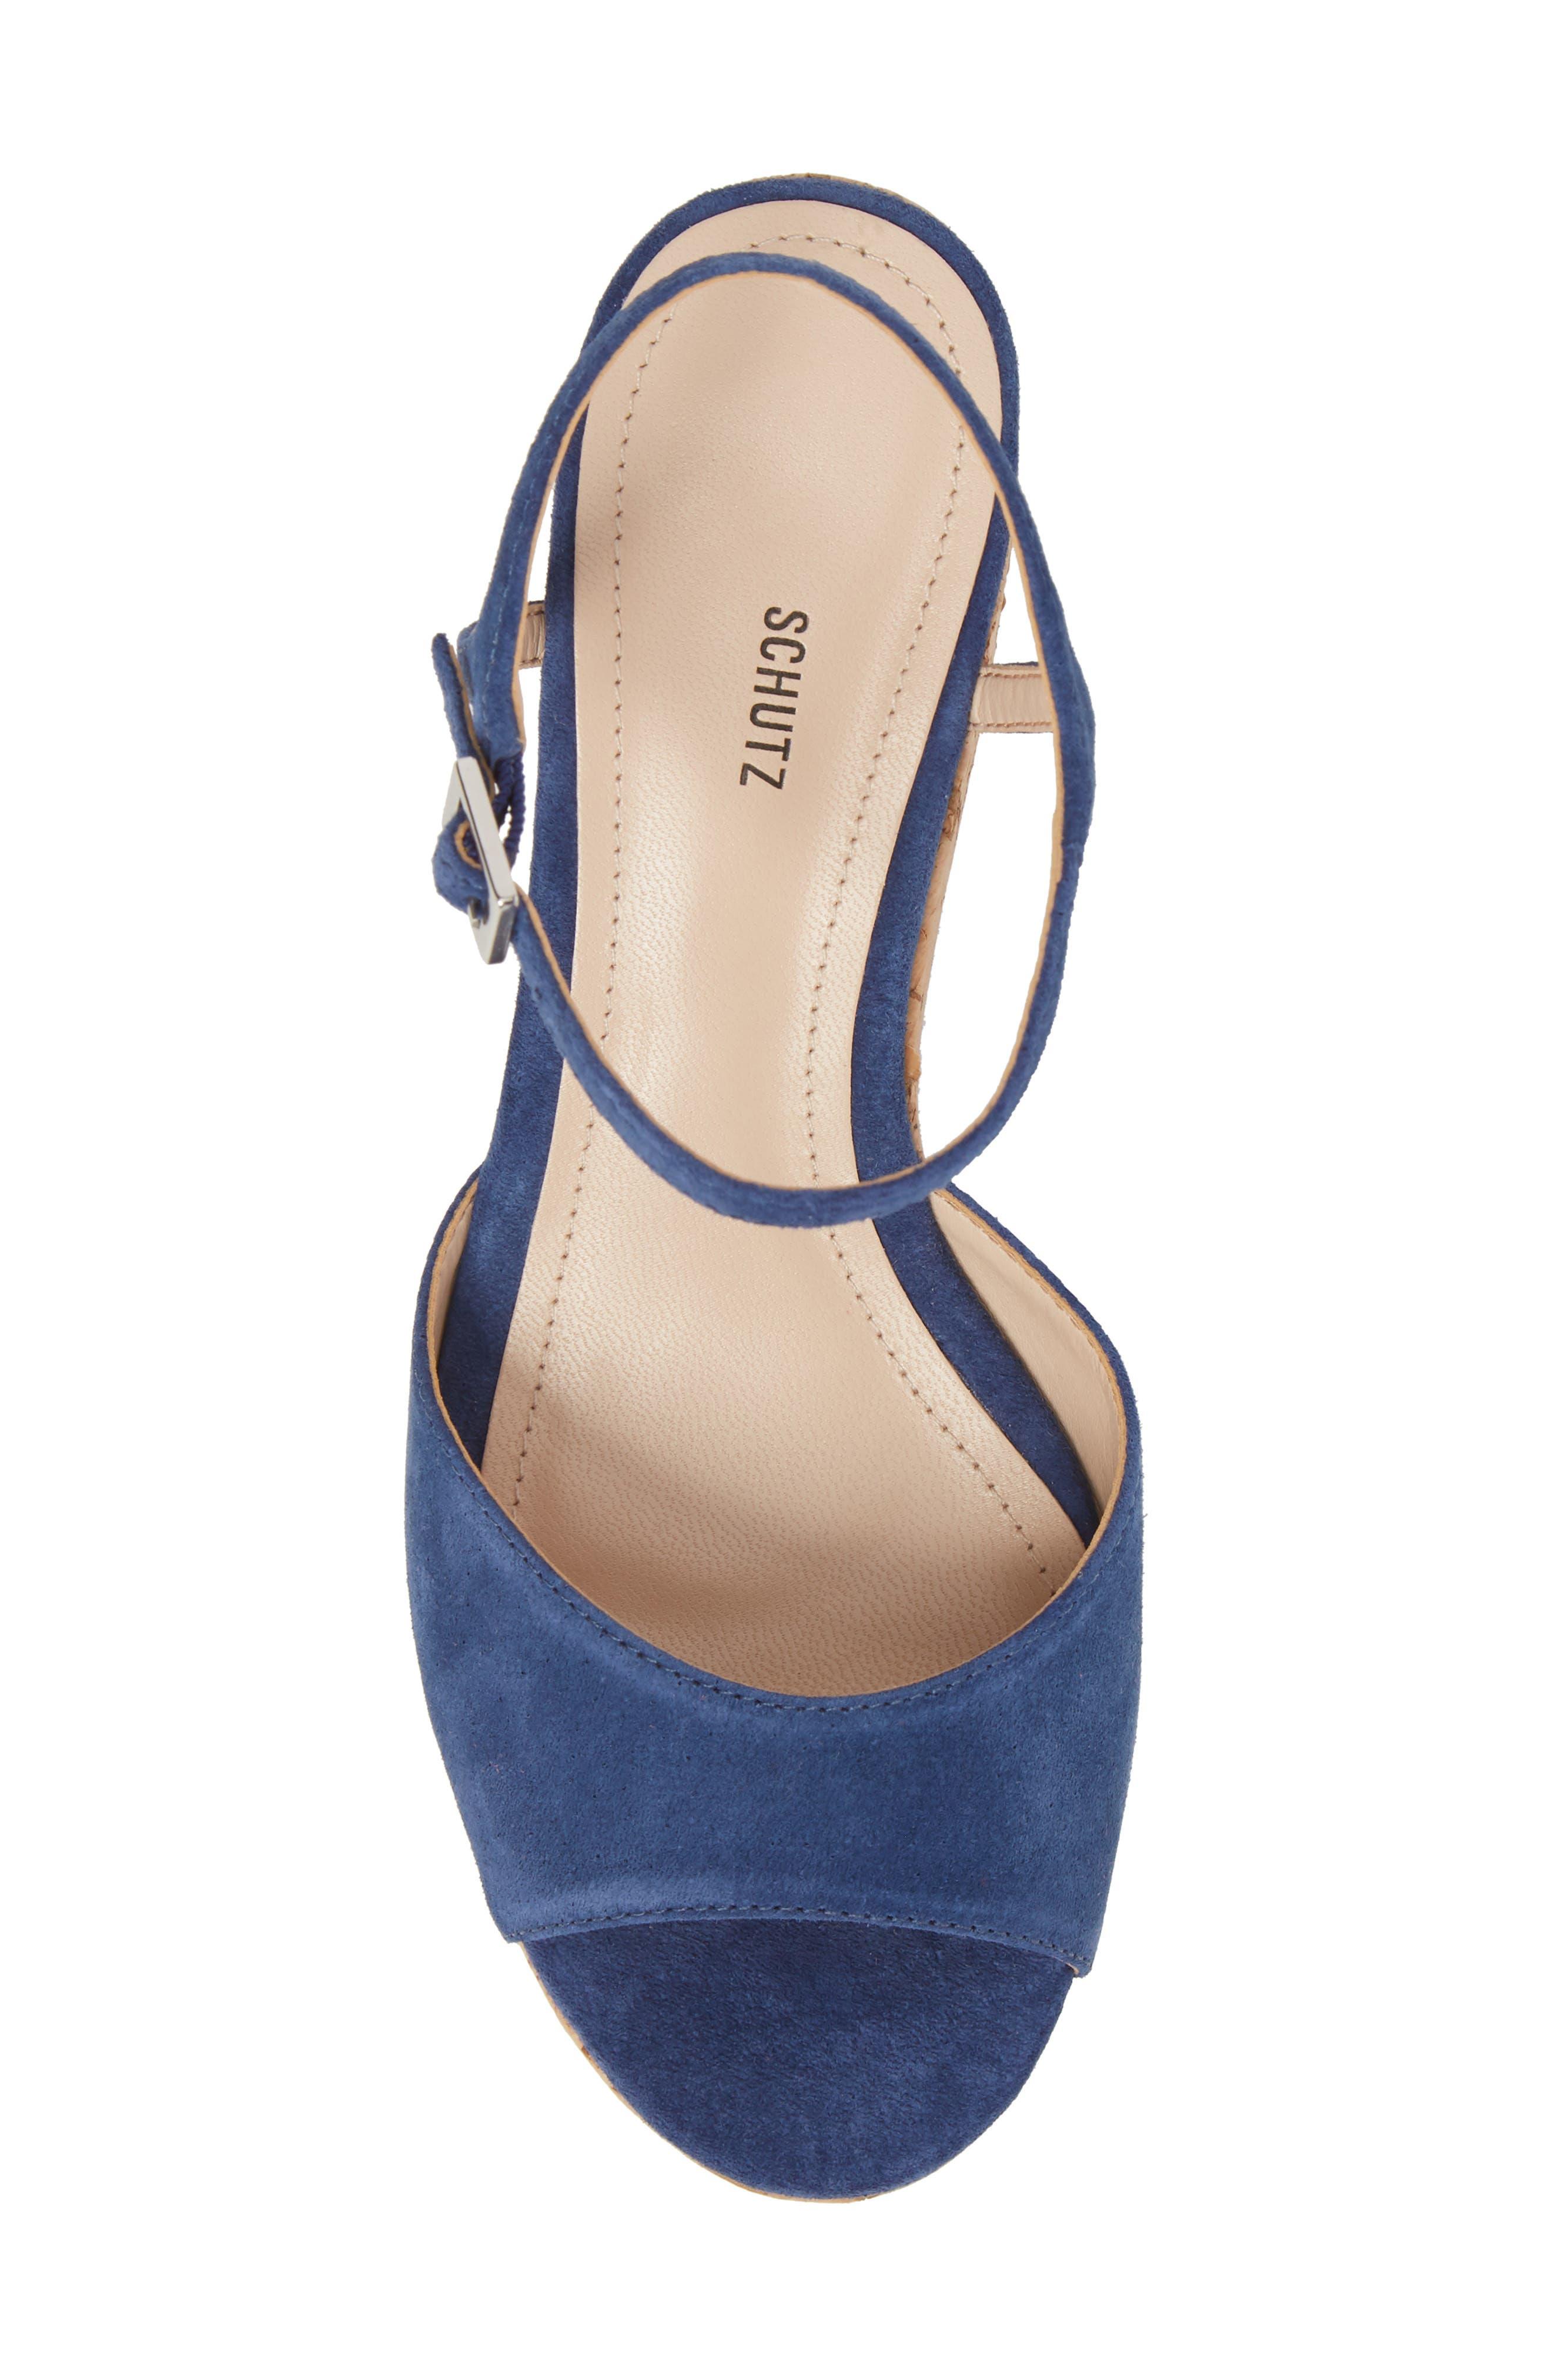 Heloise Platform Wedge Sandal,                             Alternate thumbnail 5, color,                             Dress Blue